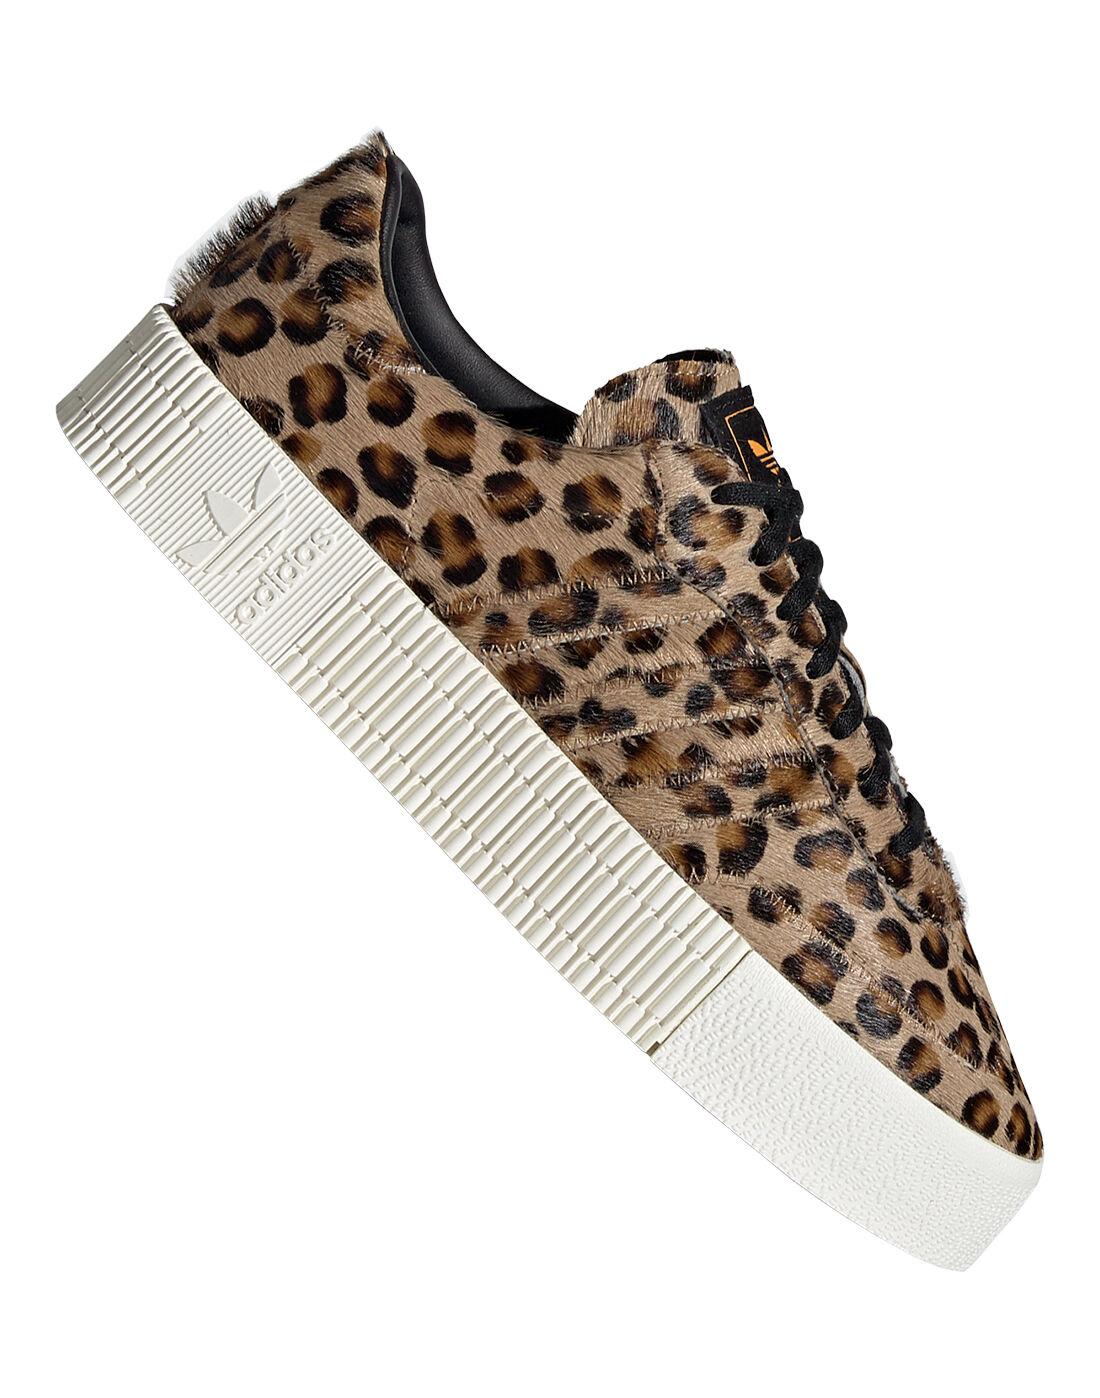 Women's Leopard Print adidas Originals Sambrarose | Life ...